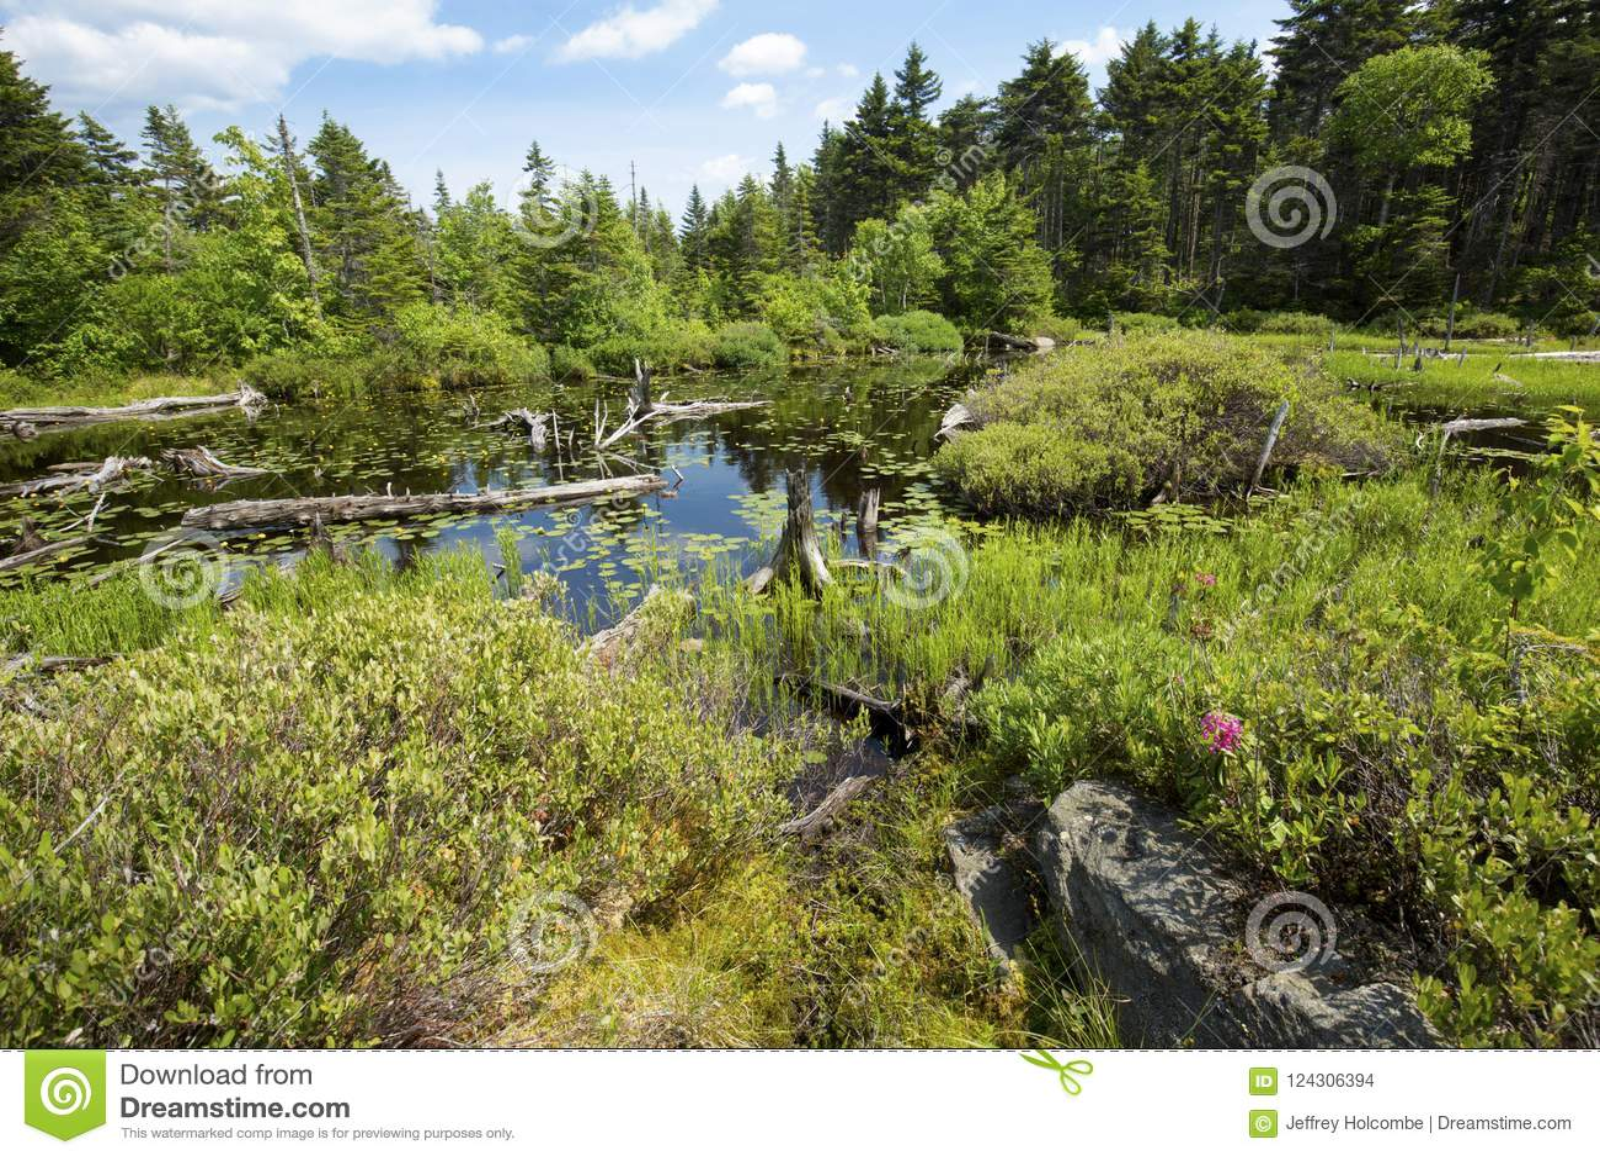 Peat bog near the summit of Mt. Sunapee, New Hampshire.